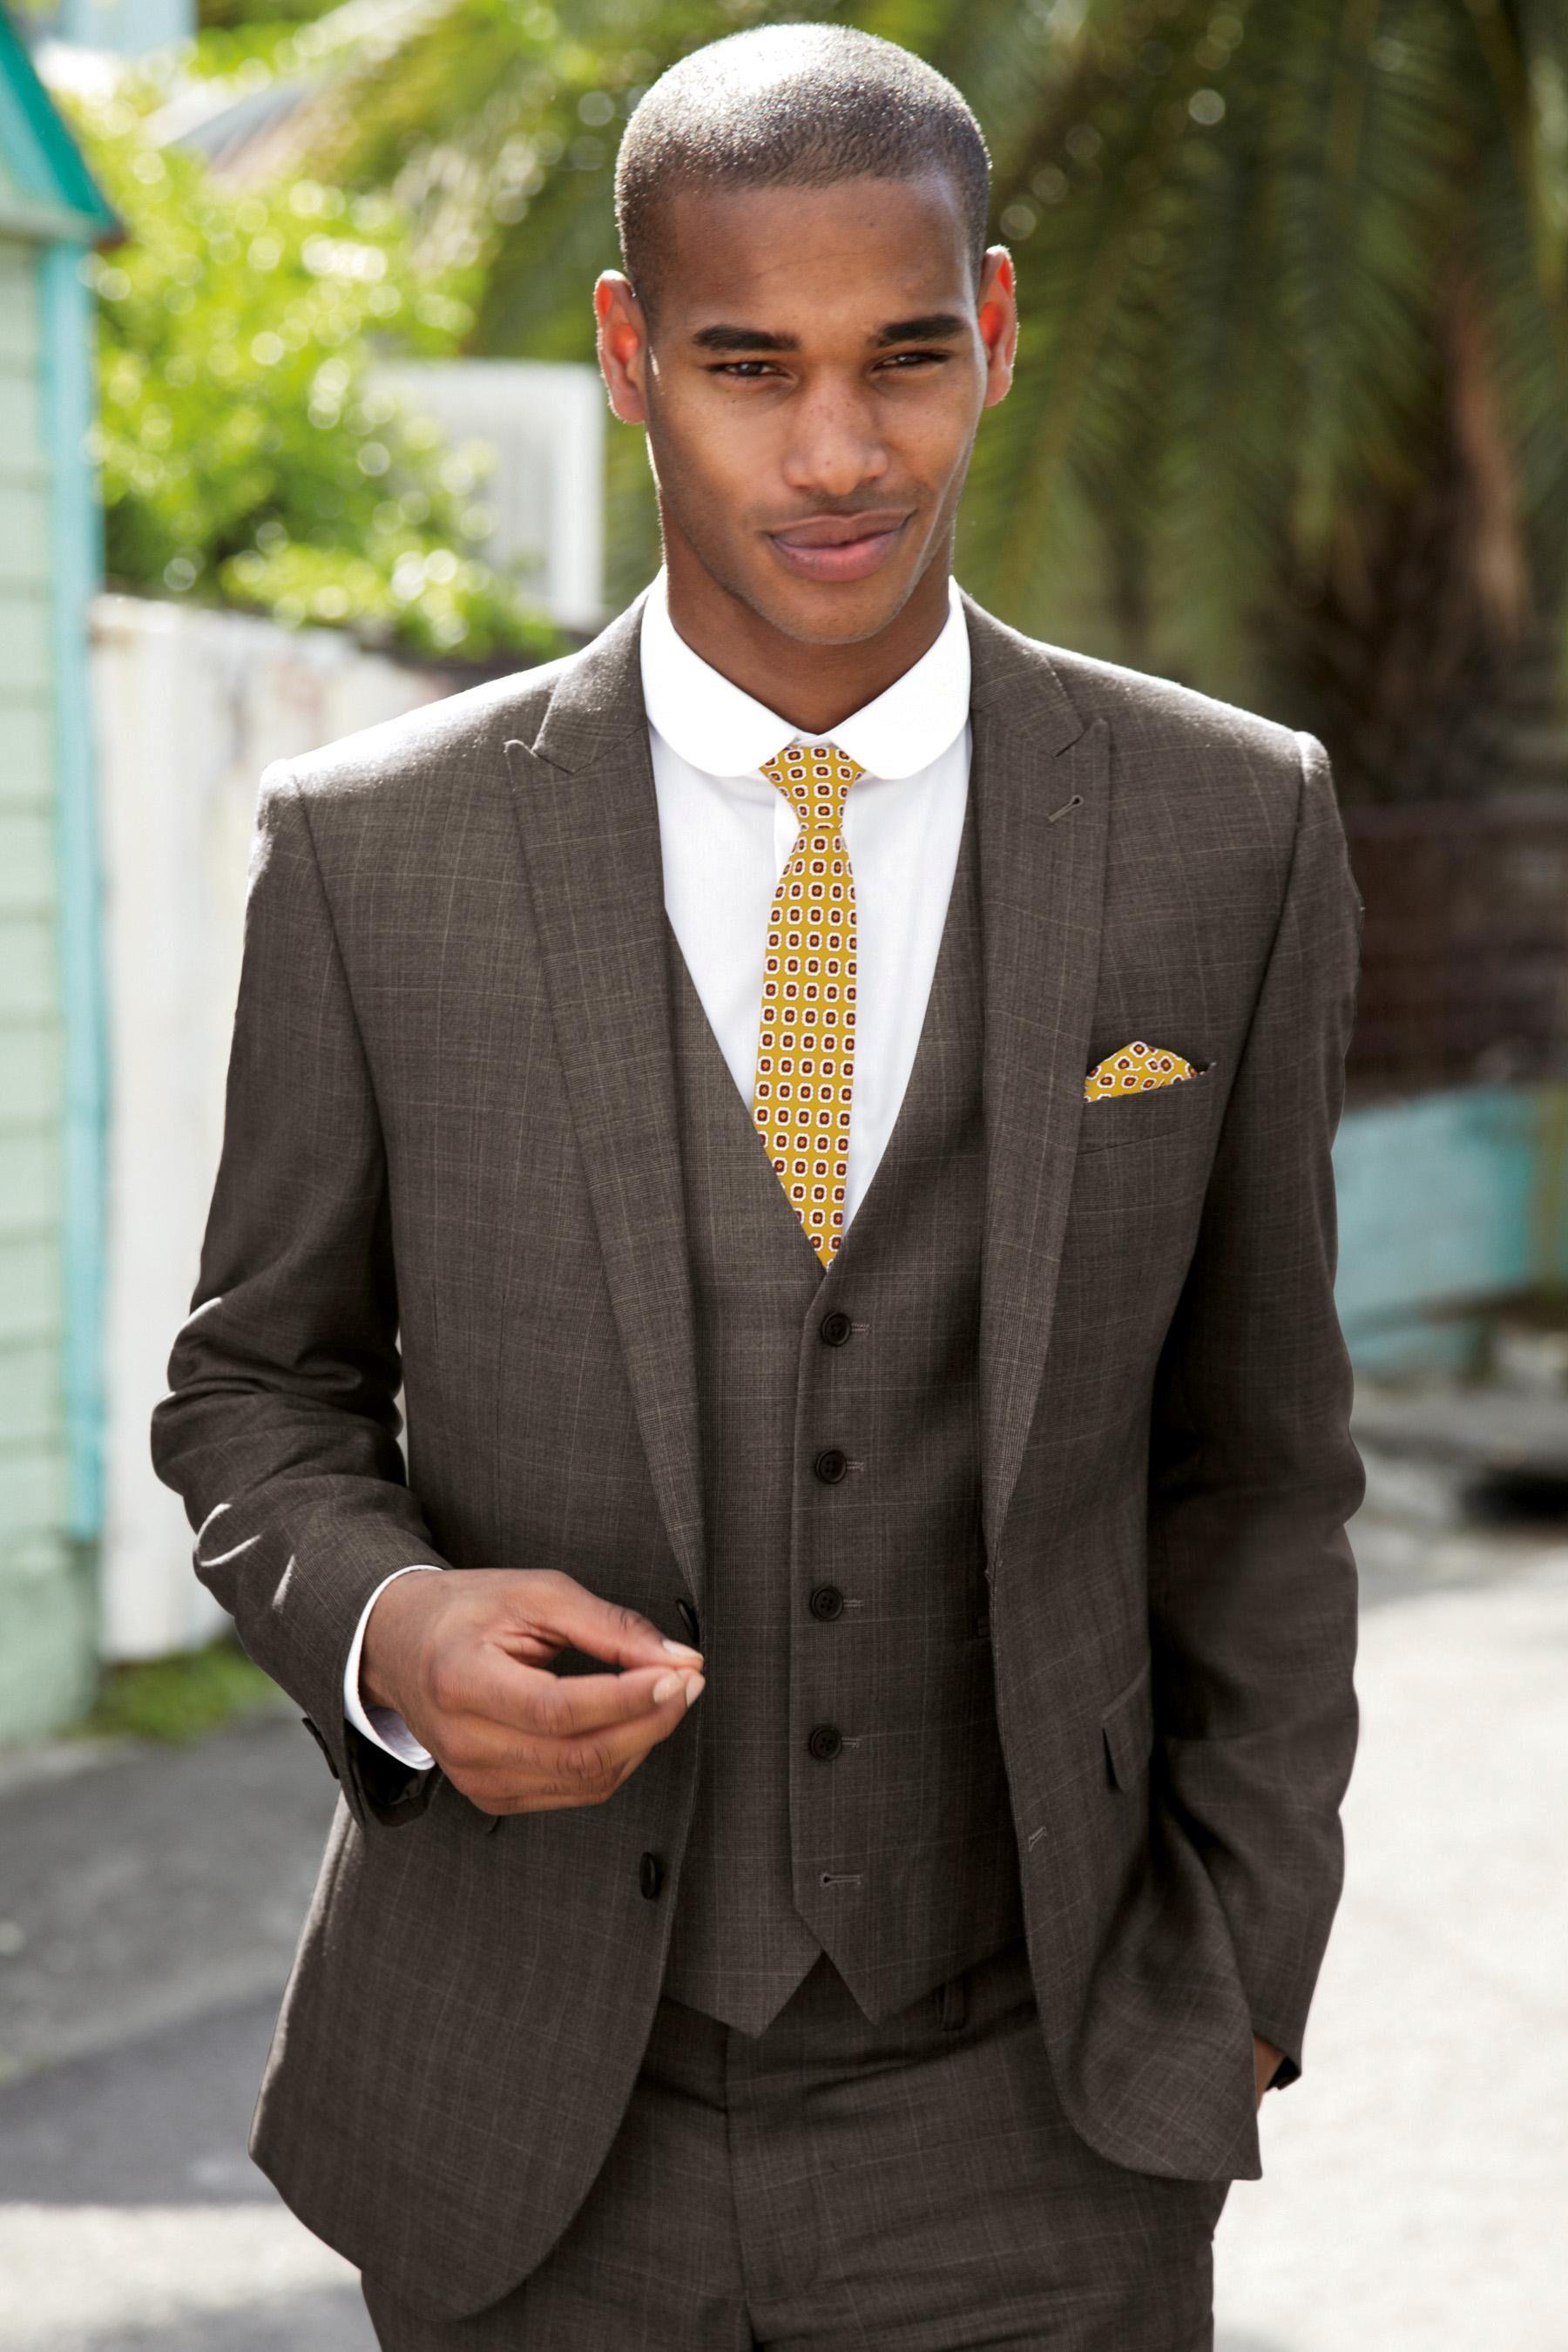 Brown Wedding Suits For Men Men Suits Slim Fit Men Tuxedos Peaked ...